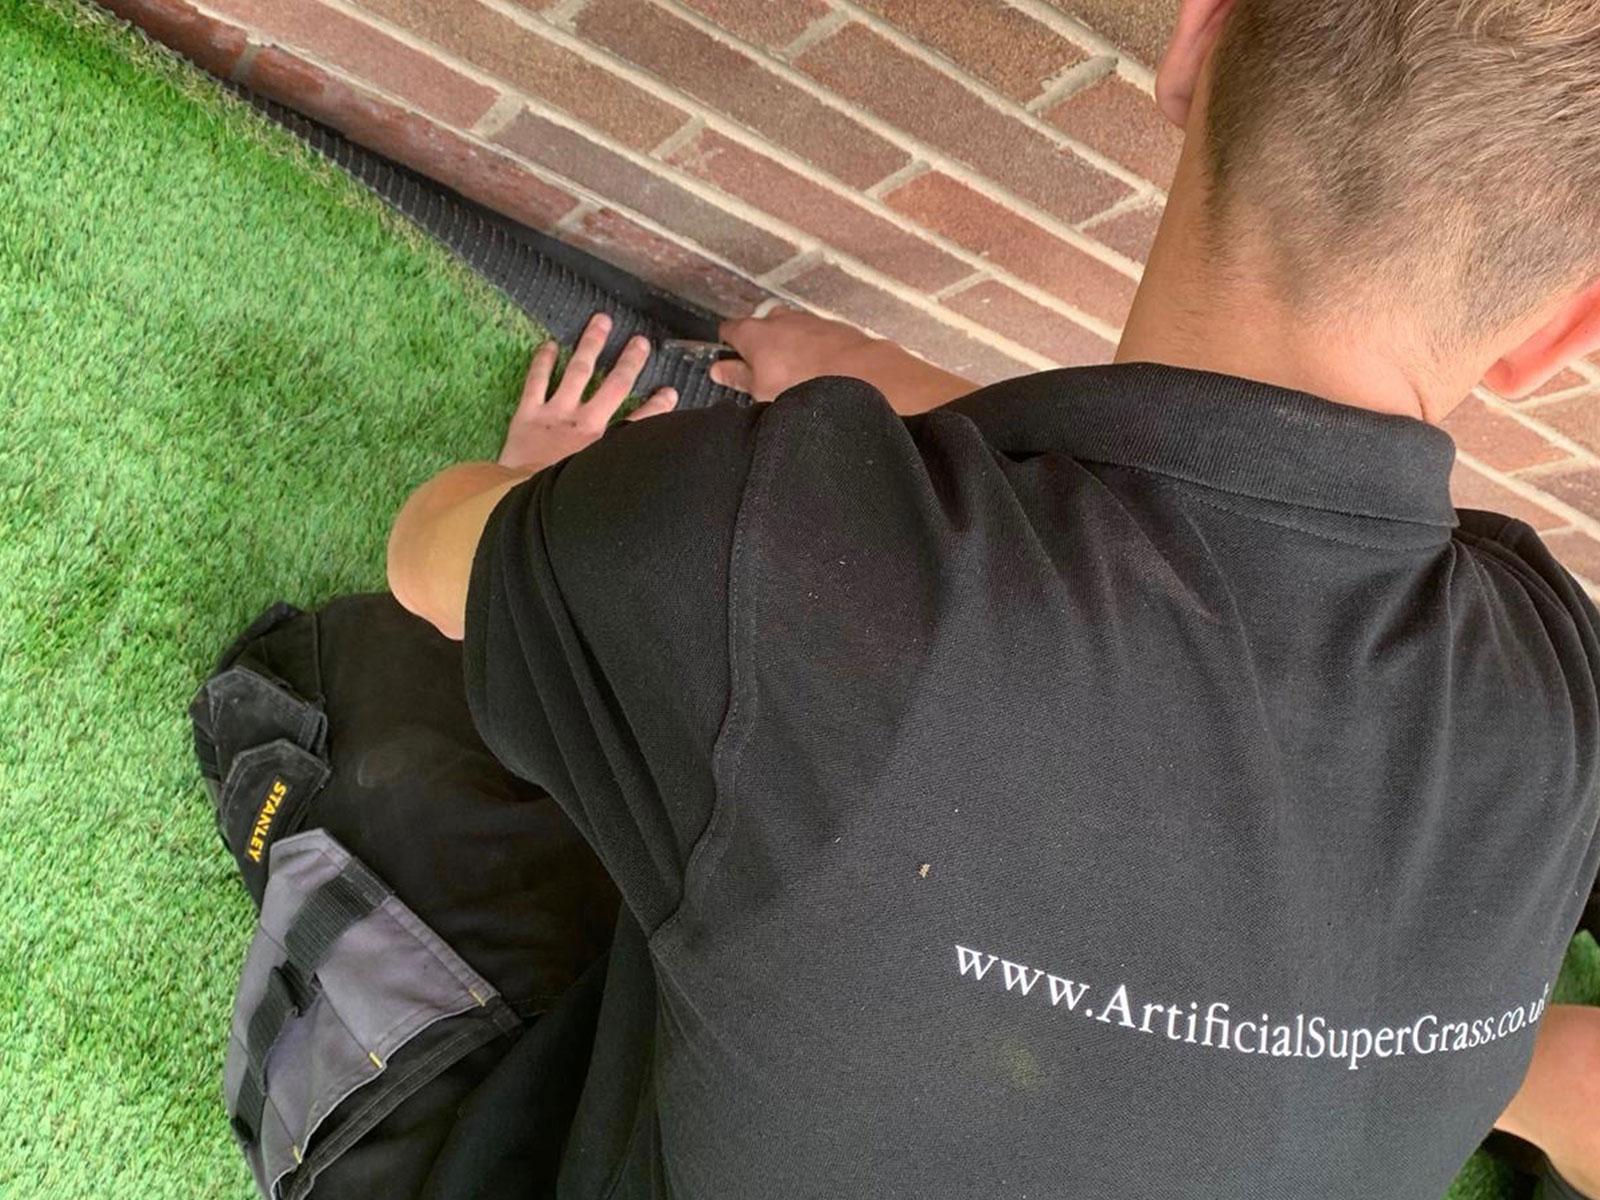 Astro Turf Basildon Artificial Super Grass